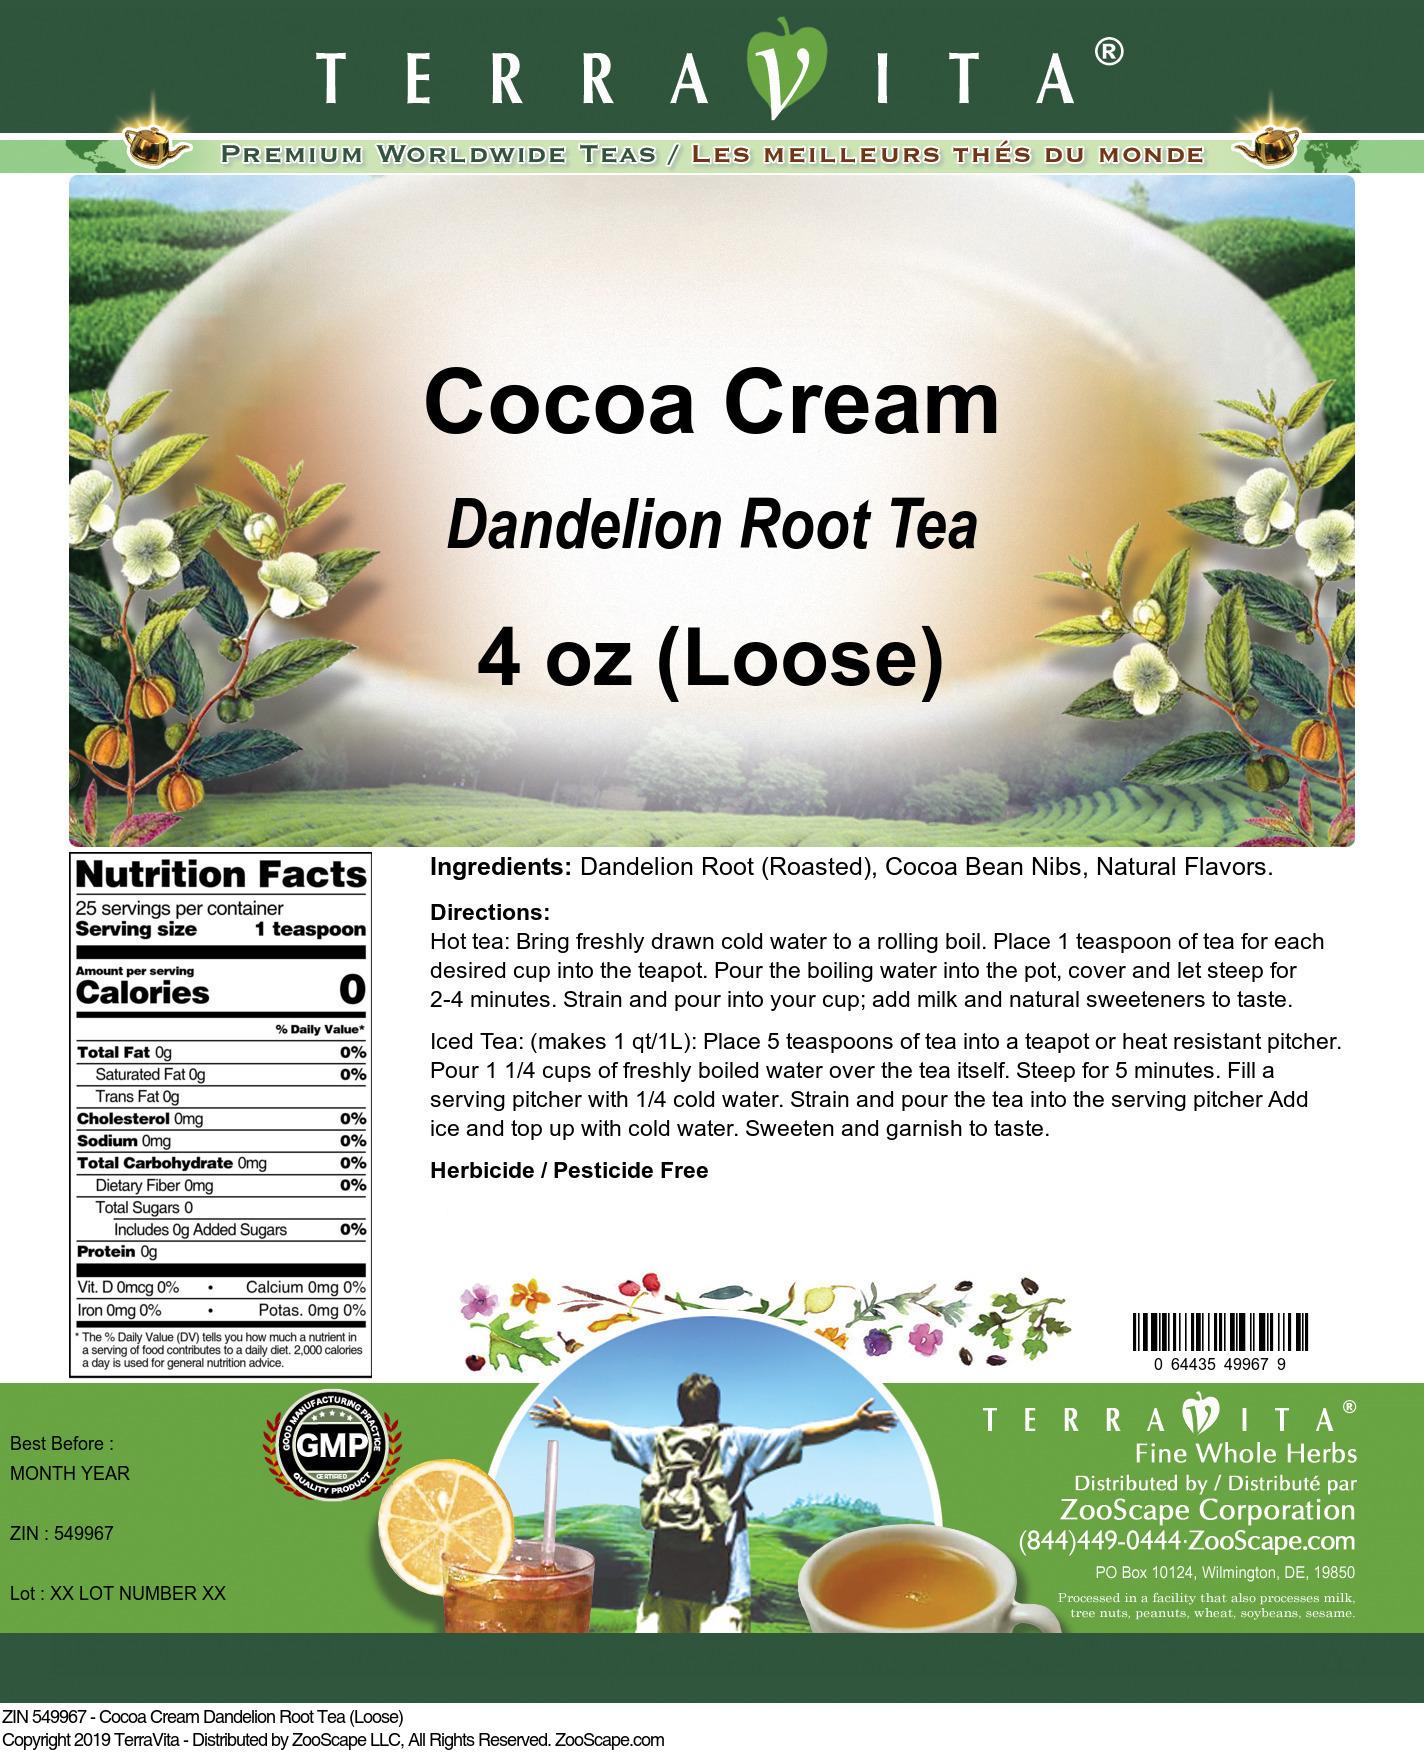 Cocoa Cream Dandelion Root Tea (Loose)